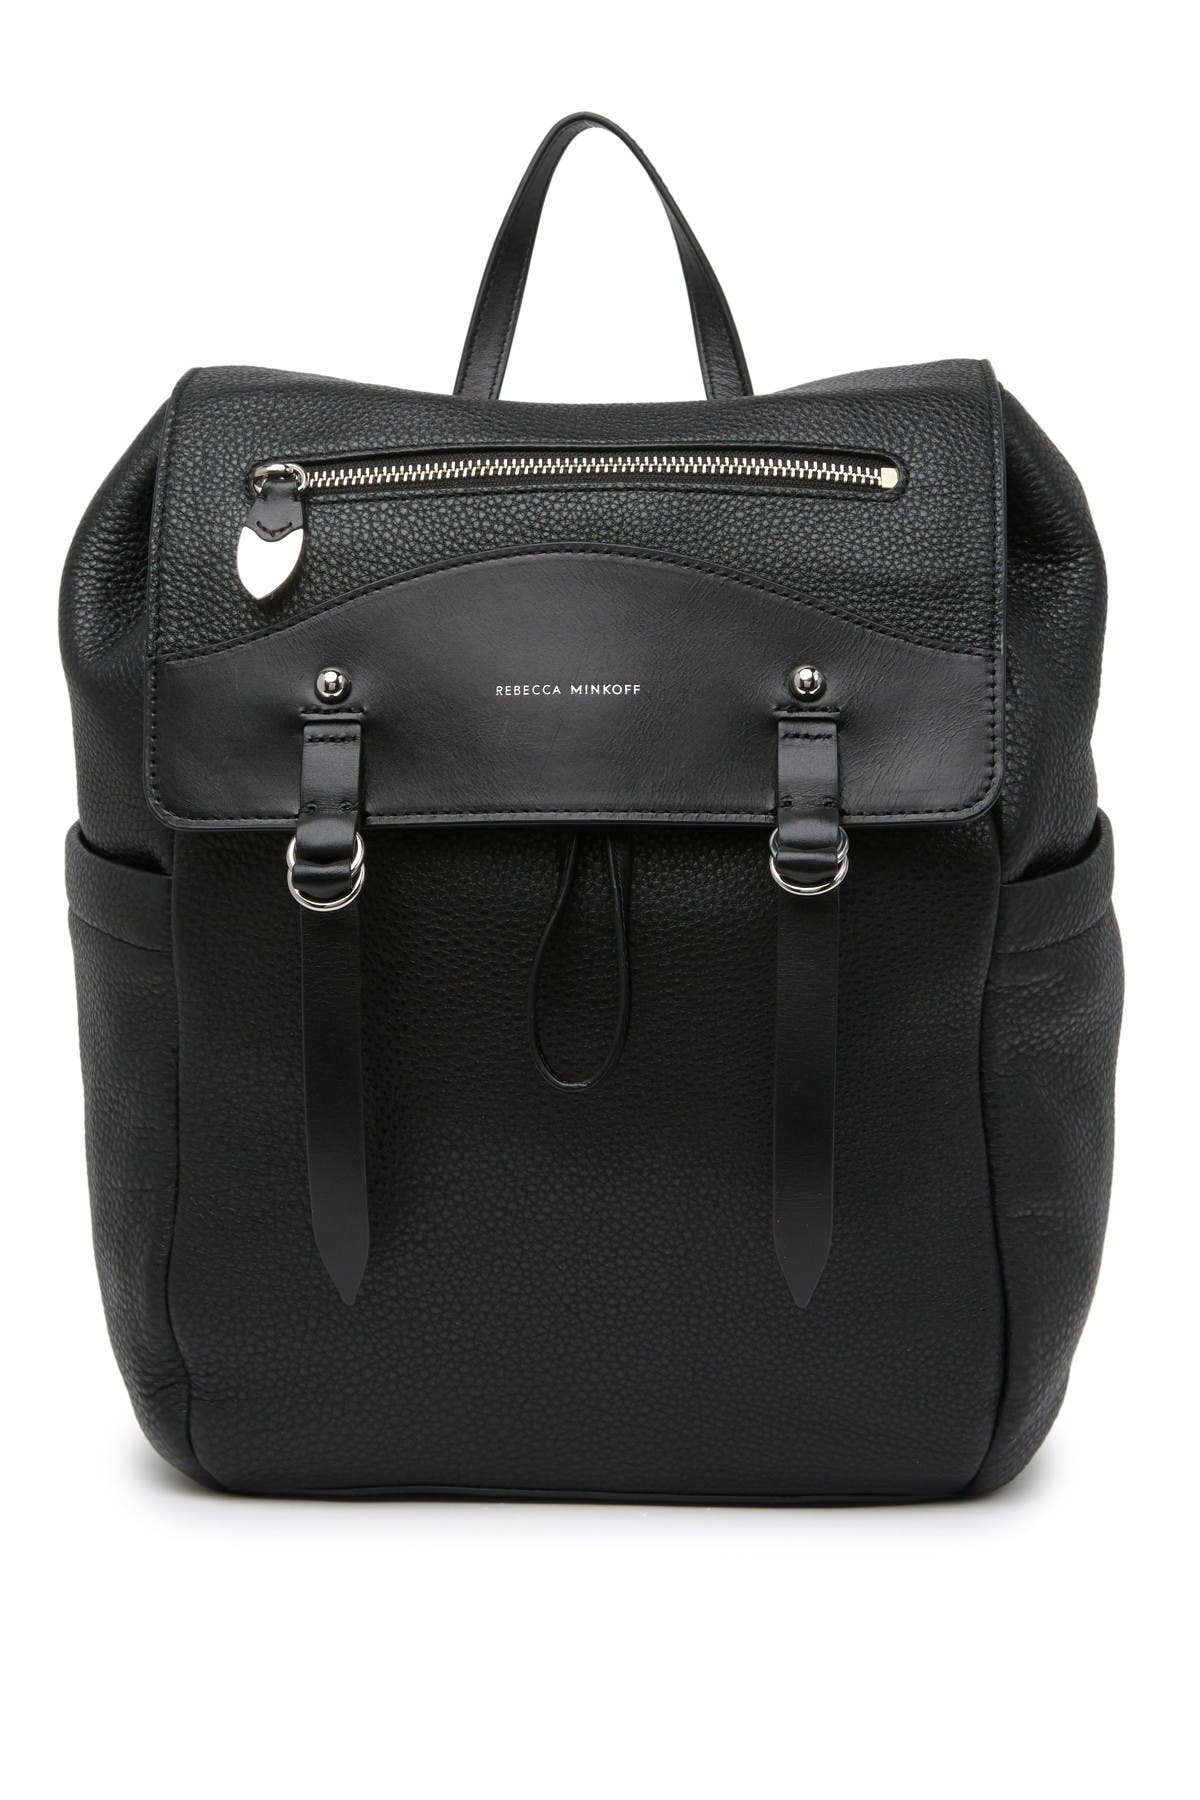 Image of Rebecca Minkoff Signature Backpack